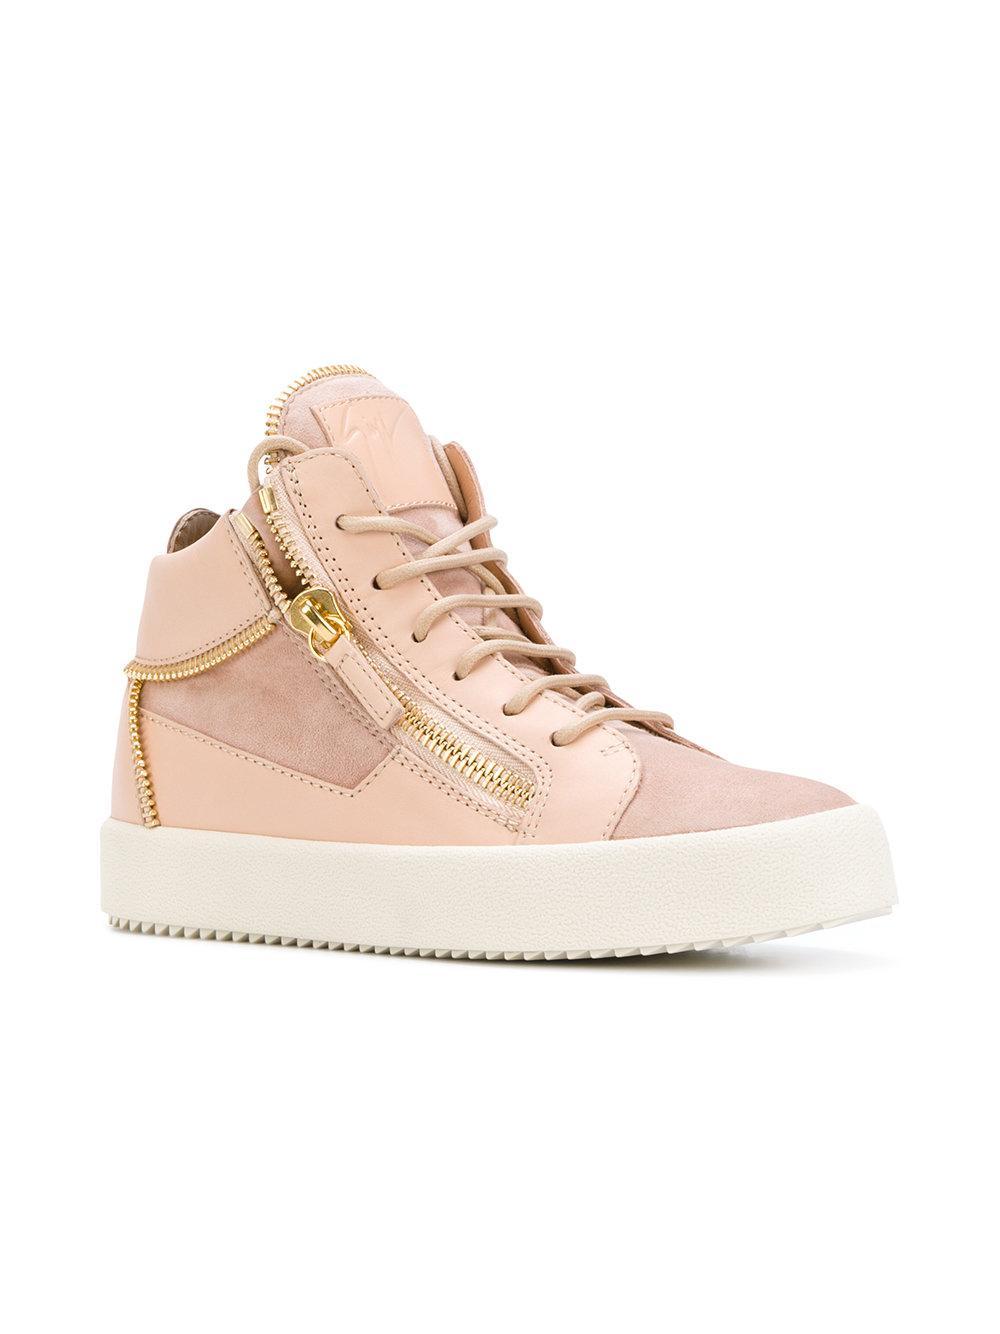 Giuseppe Zanotti May London Leather Hi-top Sneaker